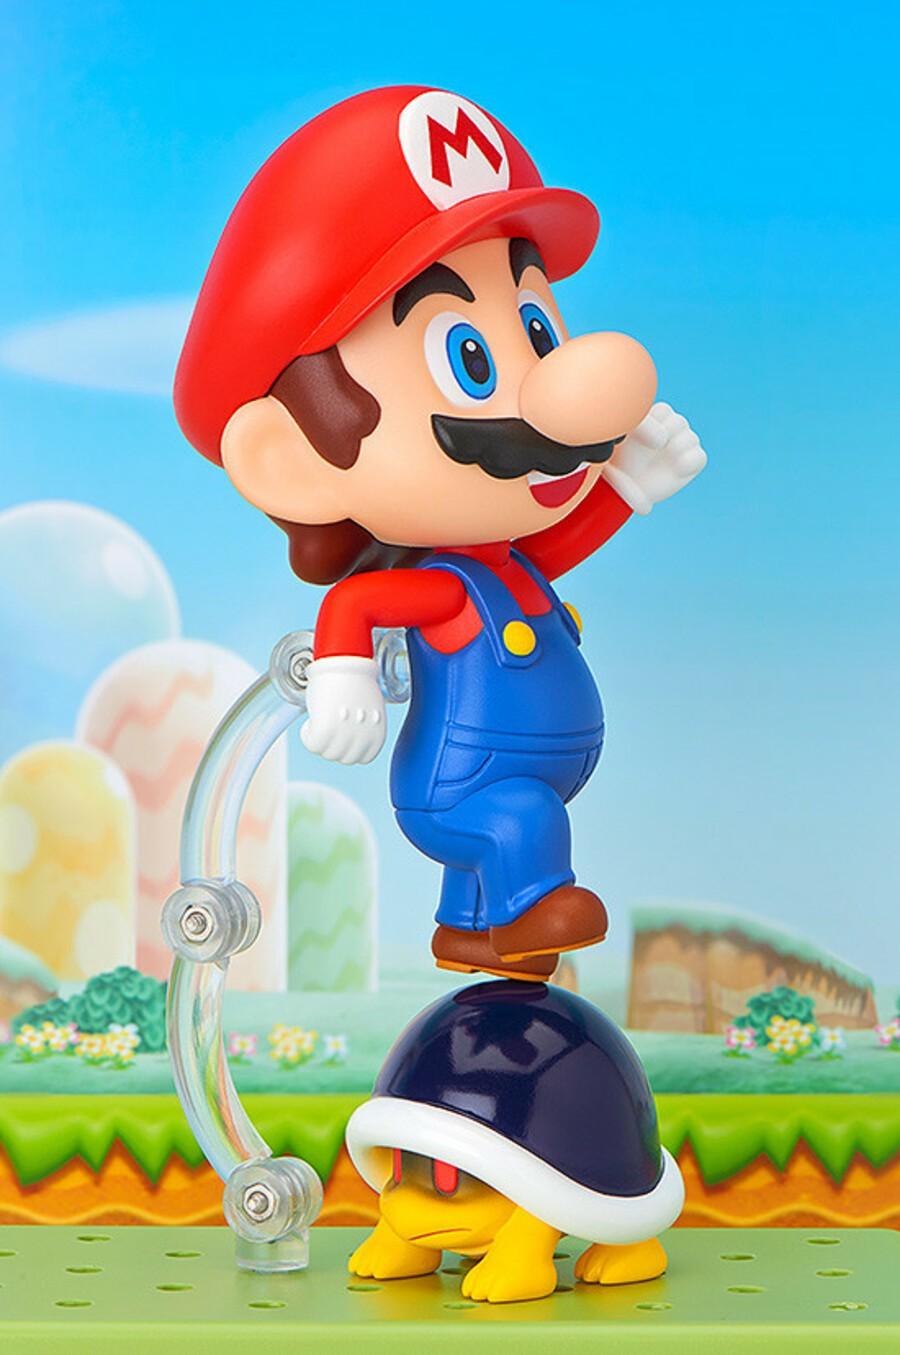 Mario jumping on shell